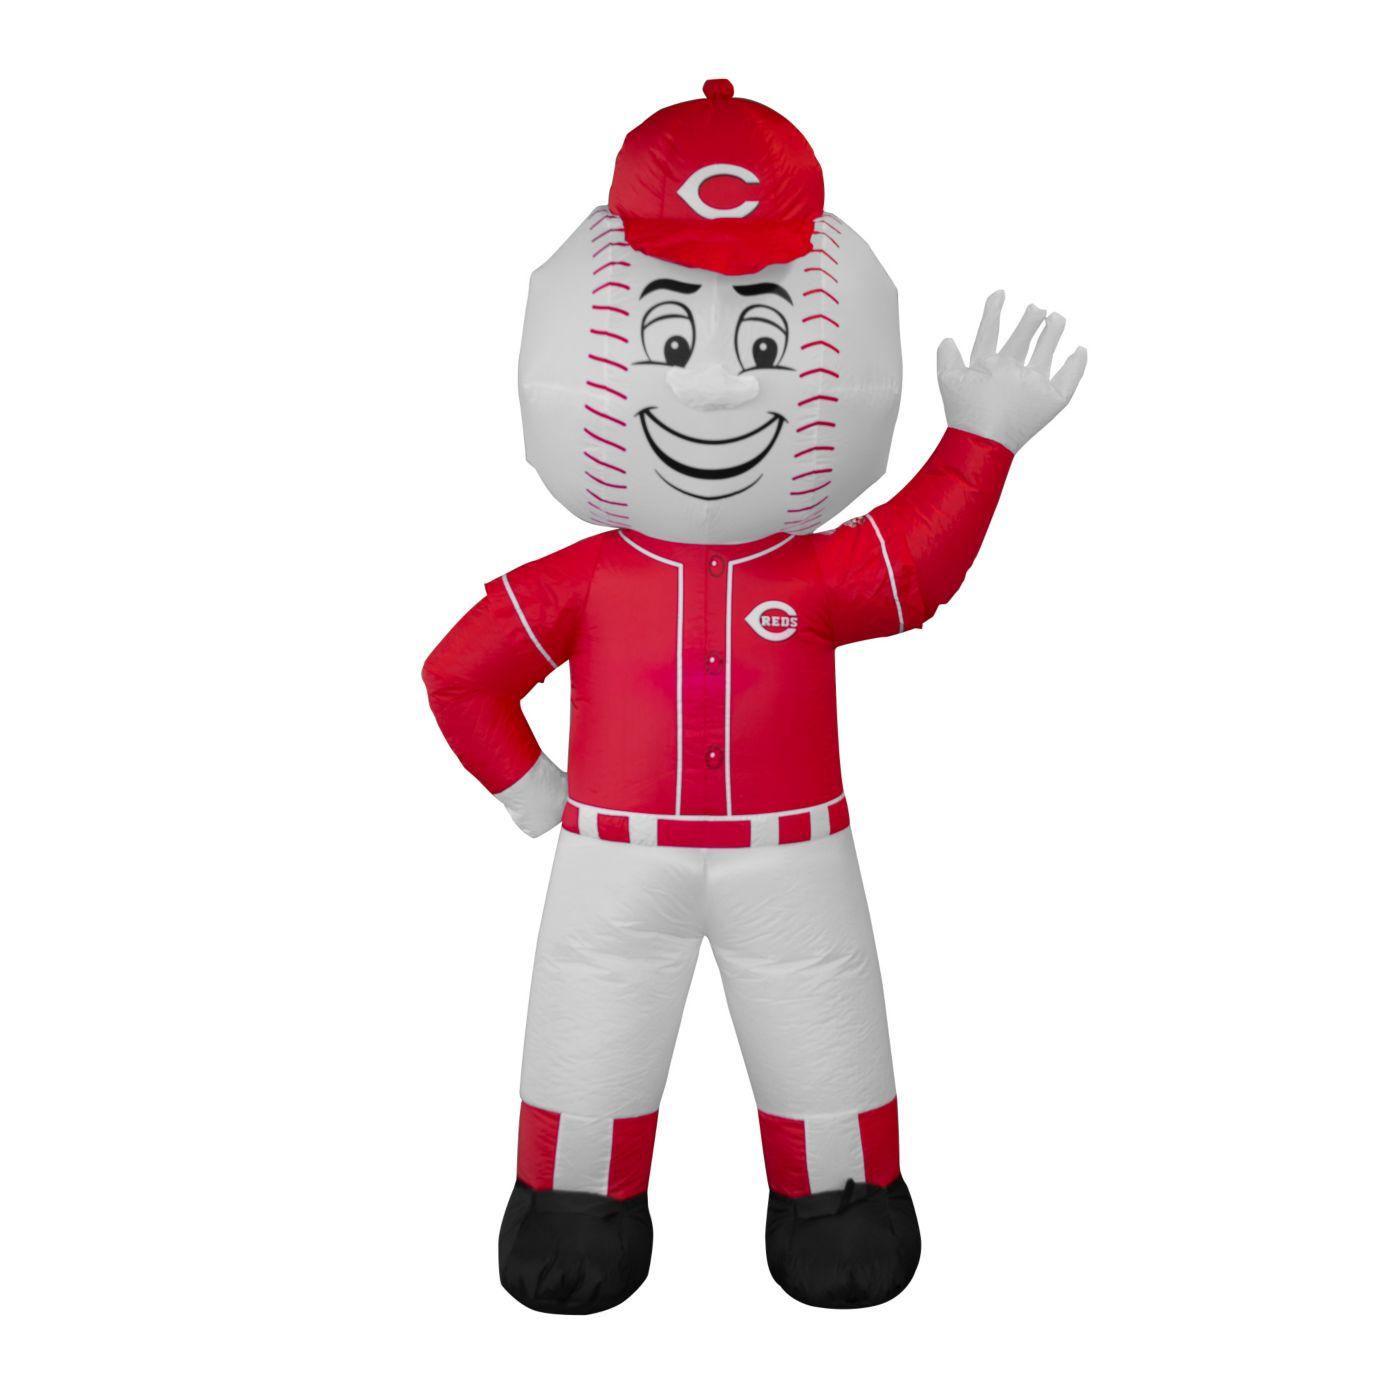 Boelter Cincinnati Reds Inflatable Mascot